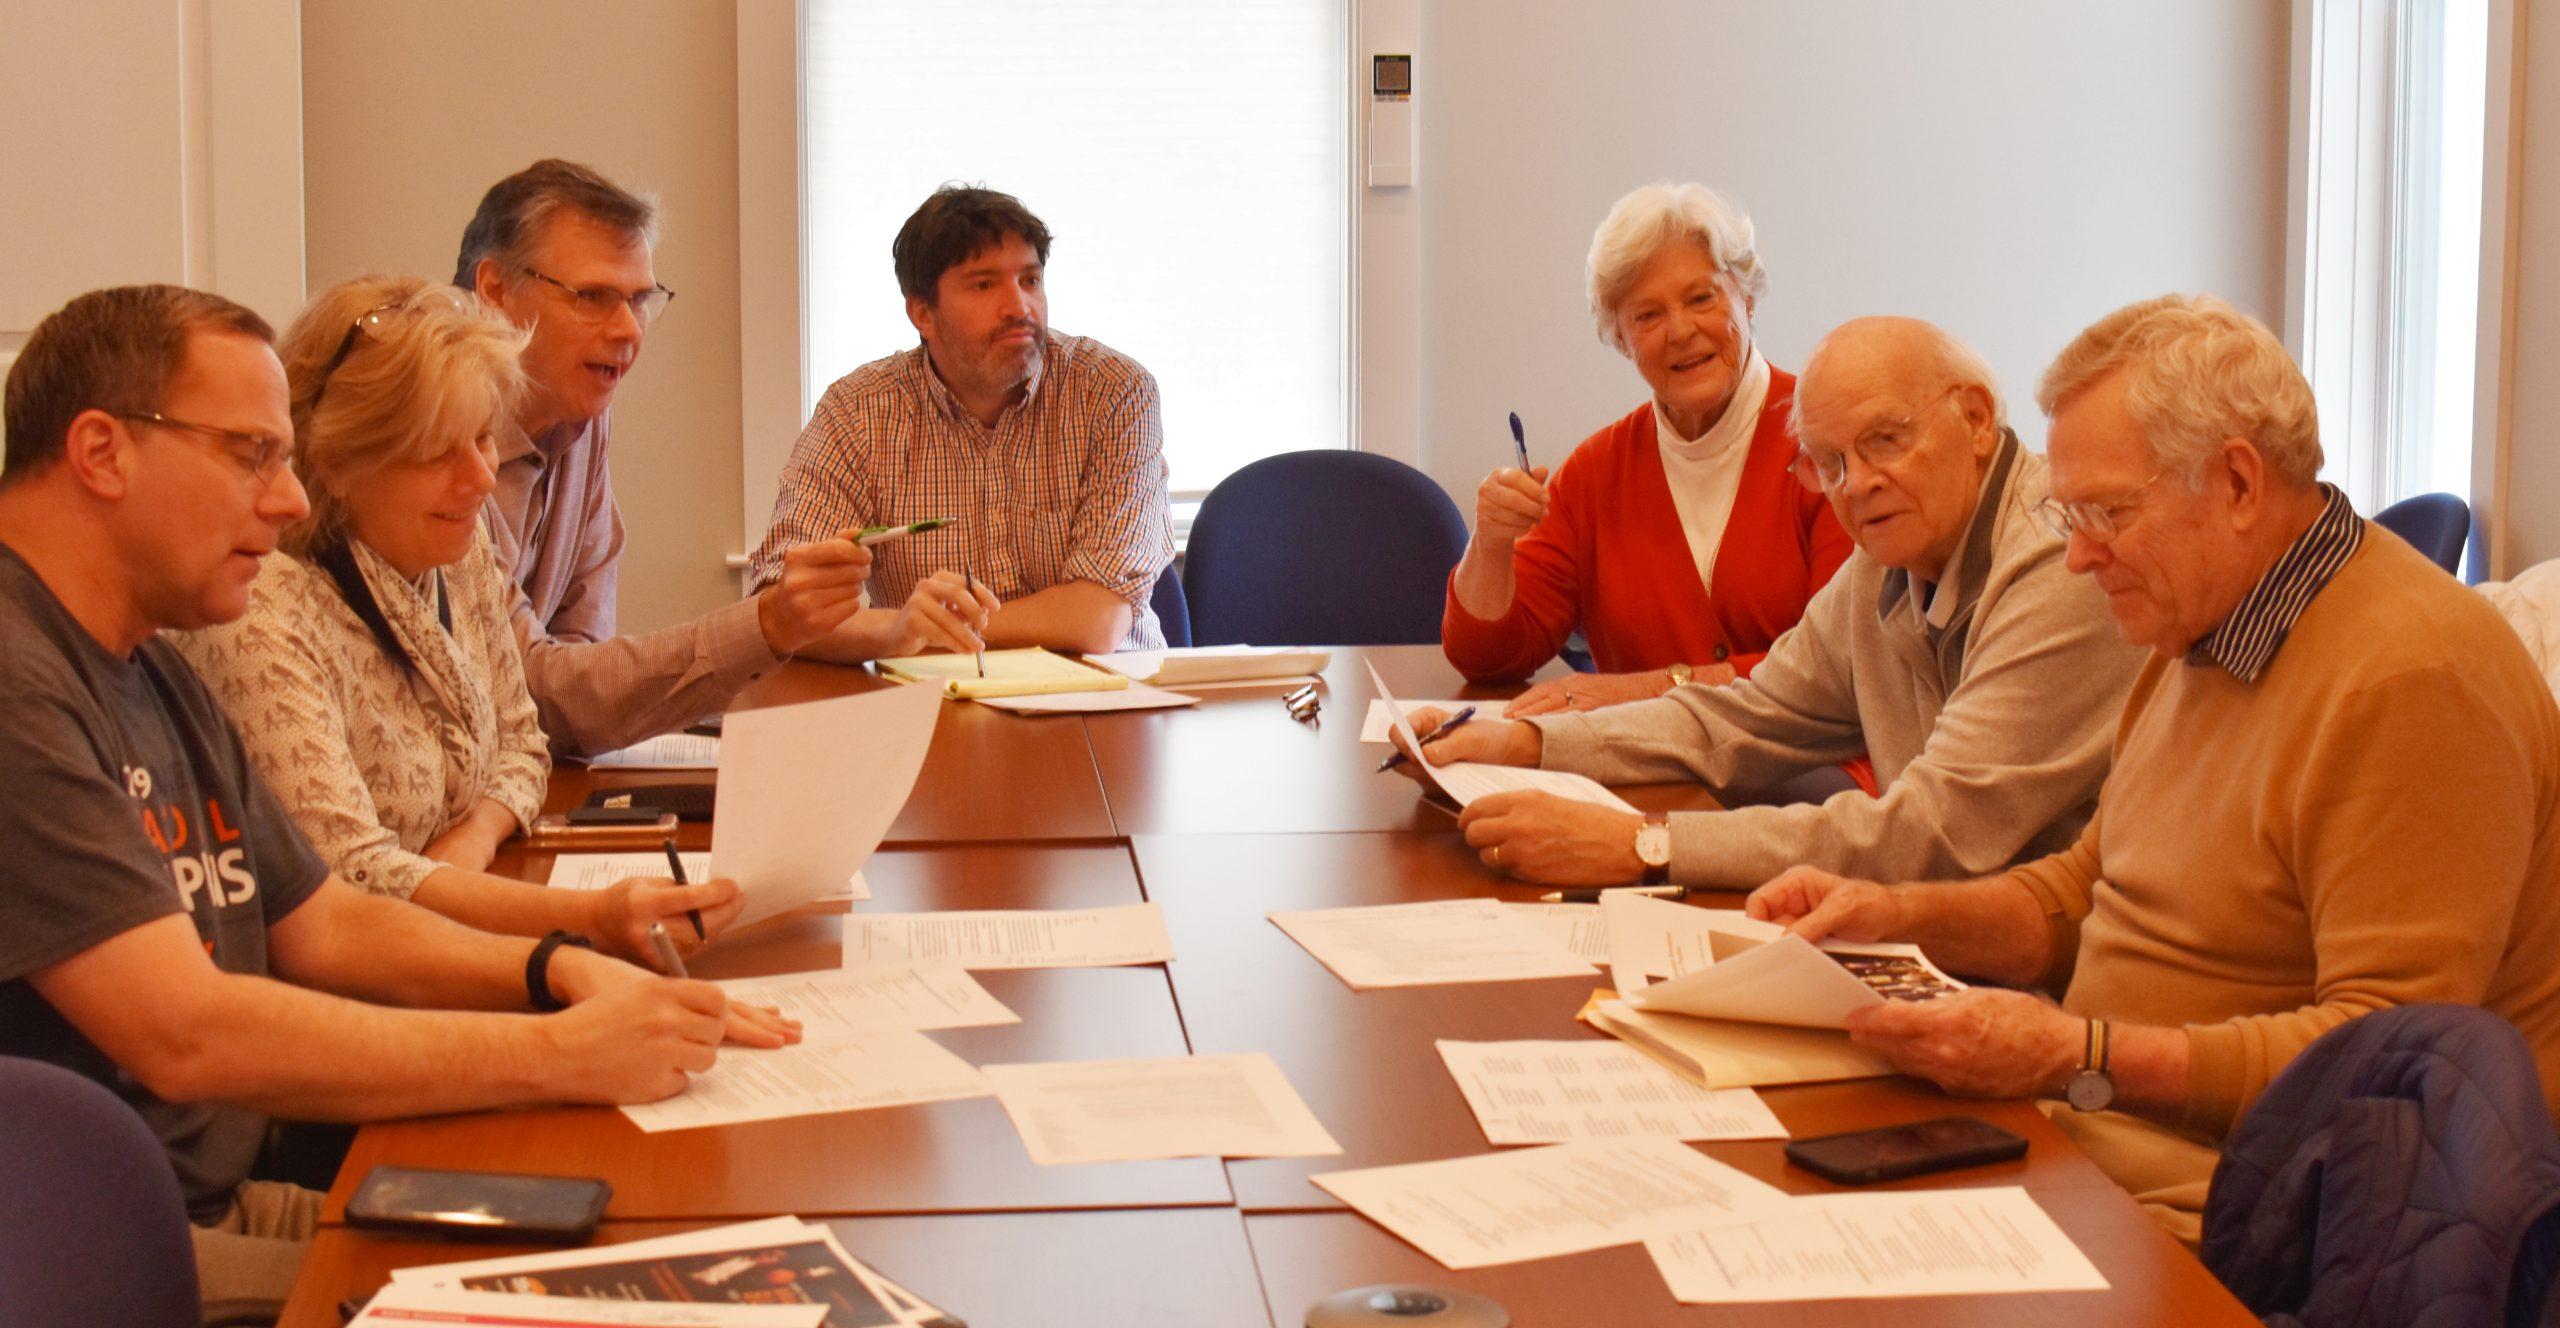 The Bracket Breakfast Committee: Steve Rappaport, Kate Hamilton, Jim Miller, Rick Wampler, Marty Sayler, Bob Sayler, and R. Peter Kilburn.